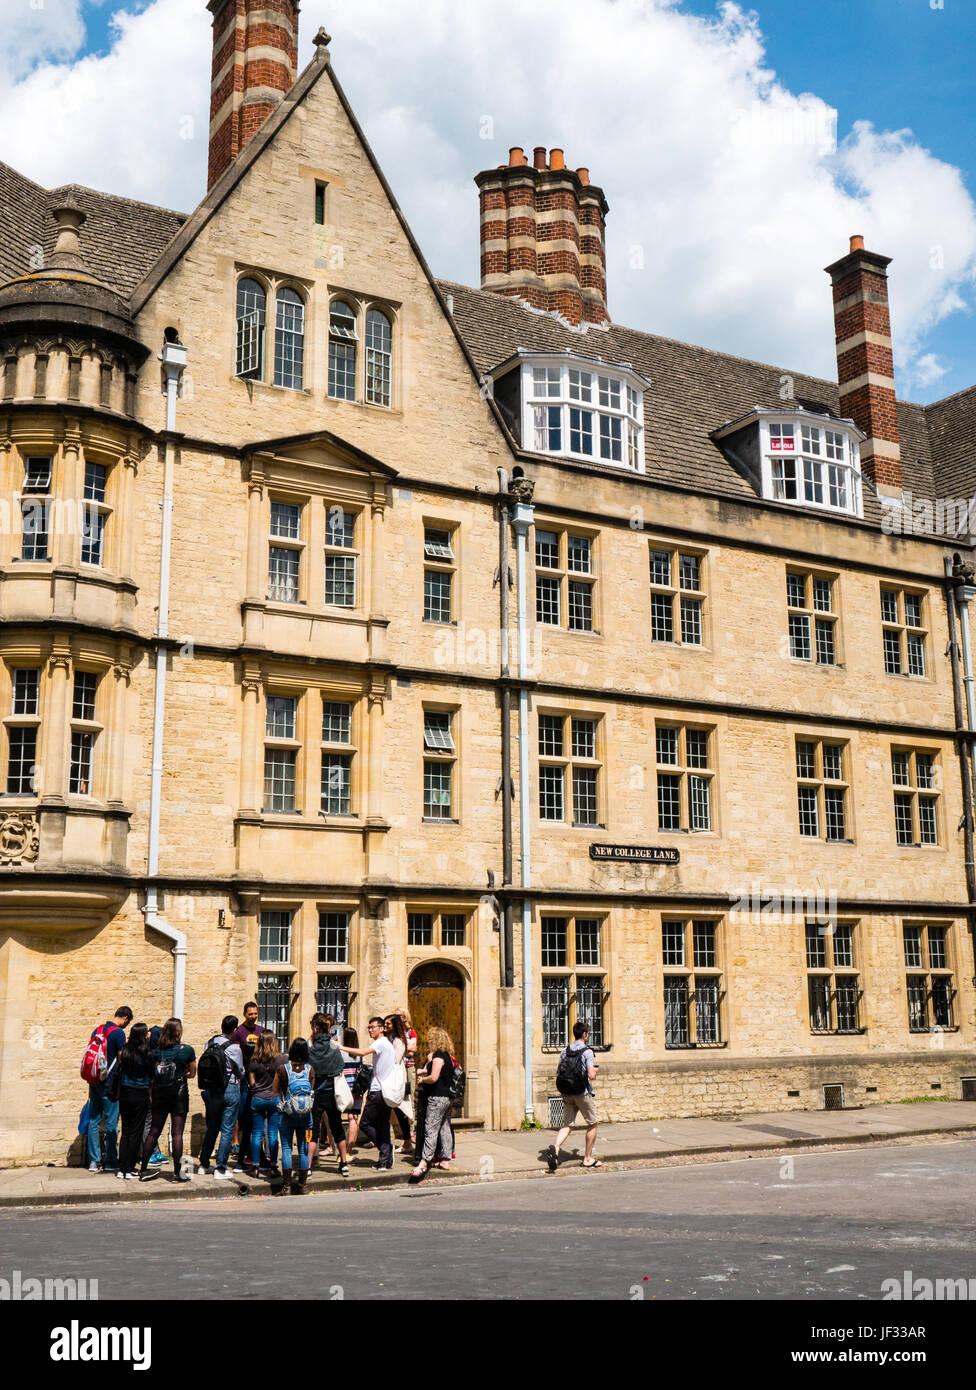 Tour Group, outside Hertford College, Oxford, Oxfordshire, England - Stock Image